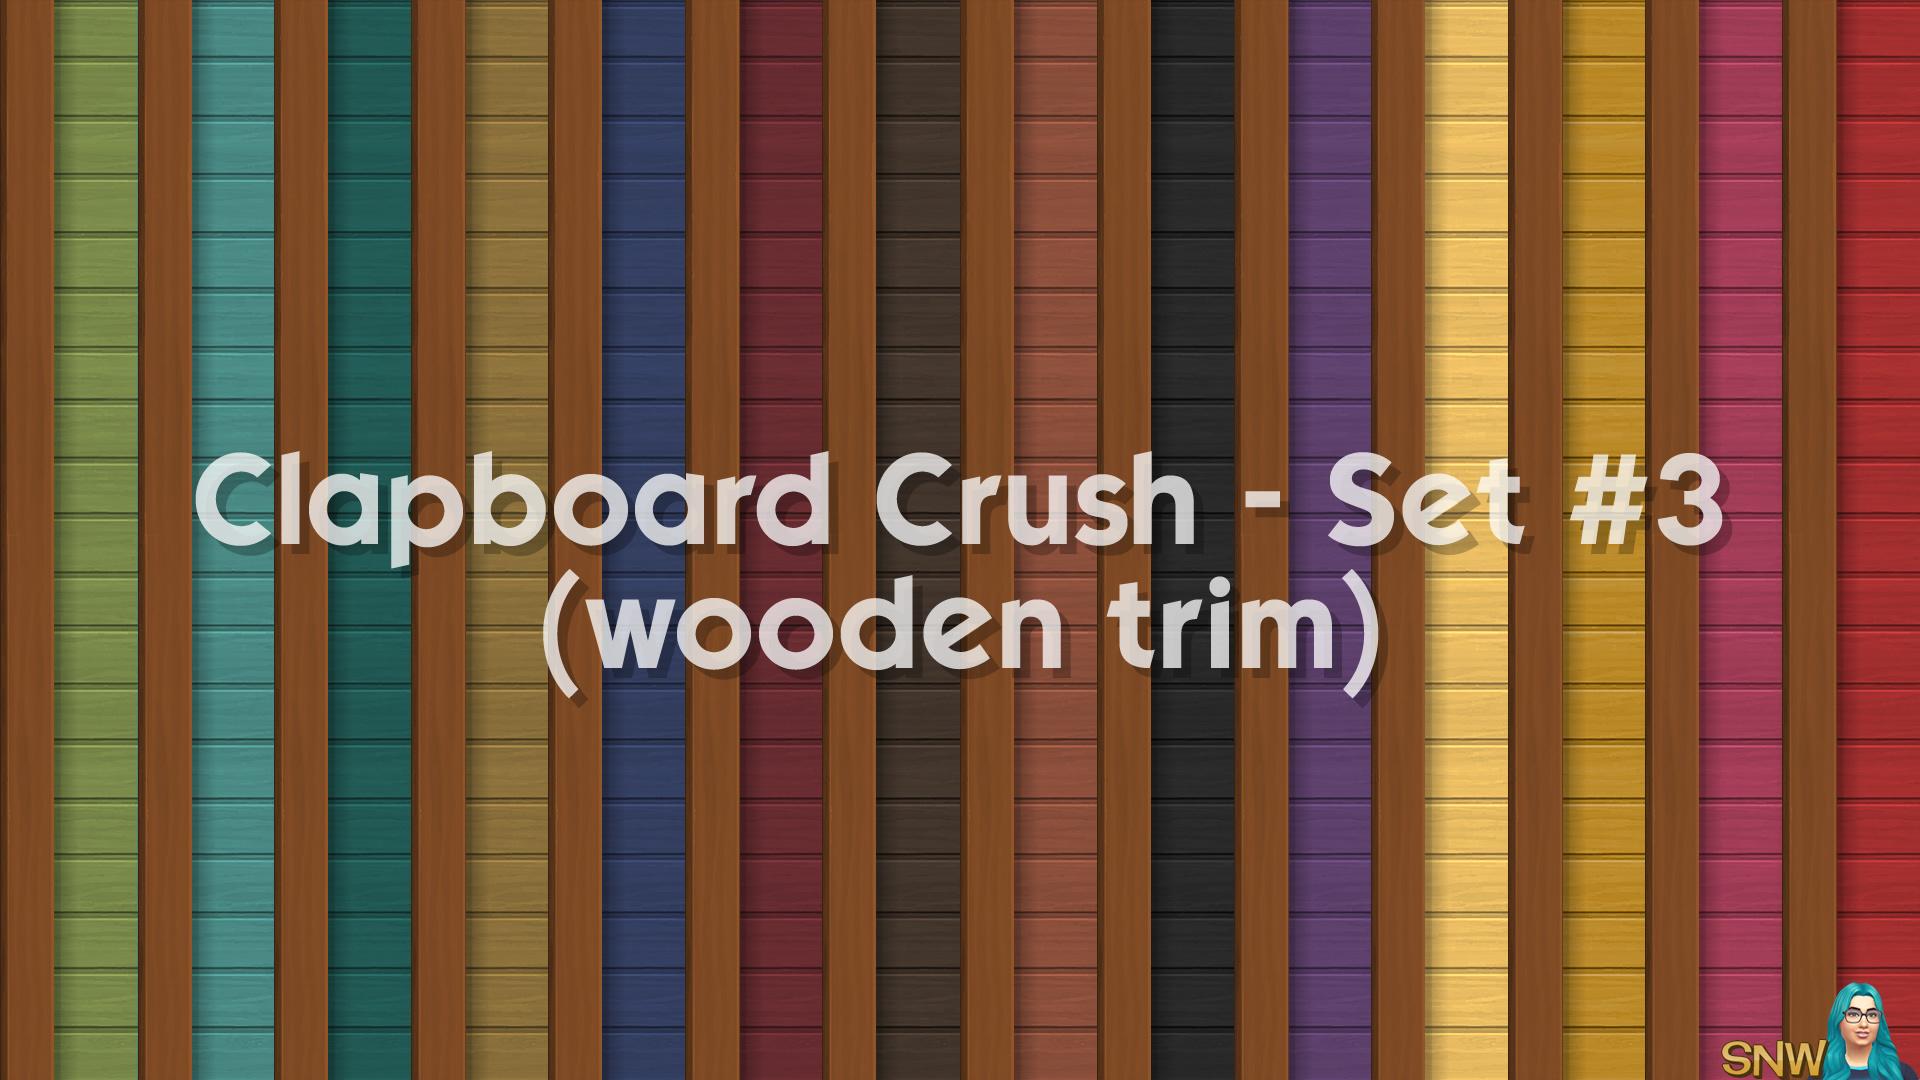 Clapboard Crush Siding Walls Set #3 (with Wooden Corner Trim)